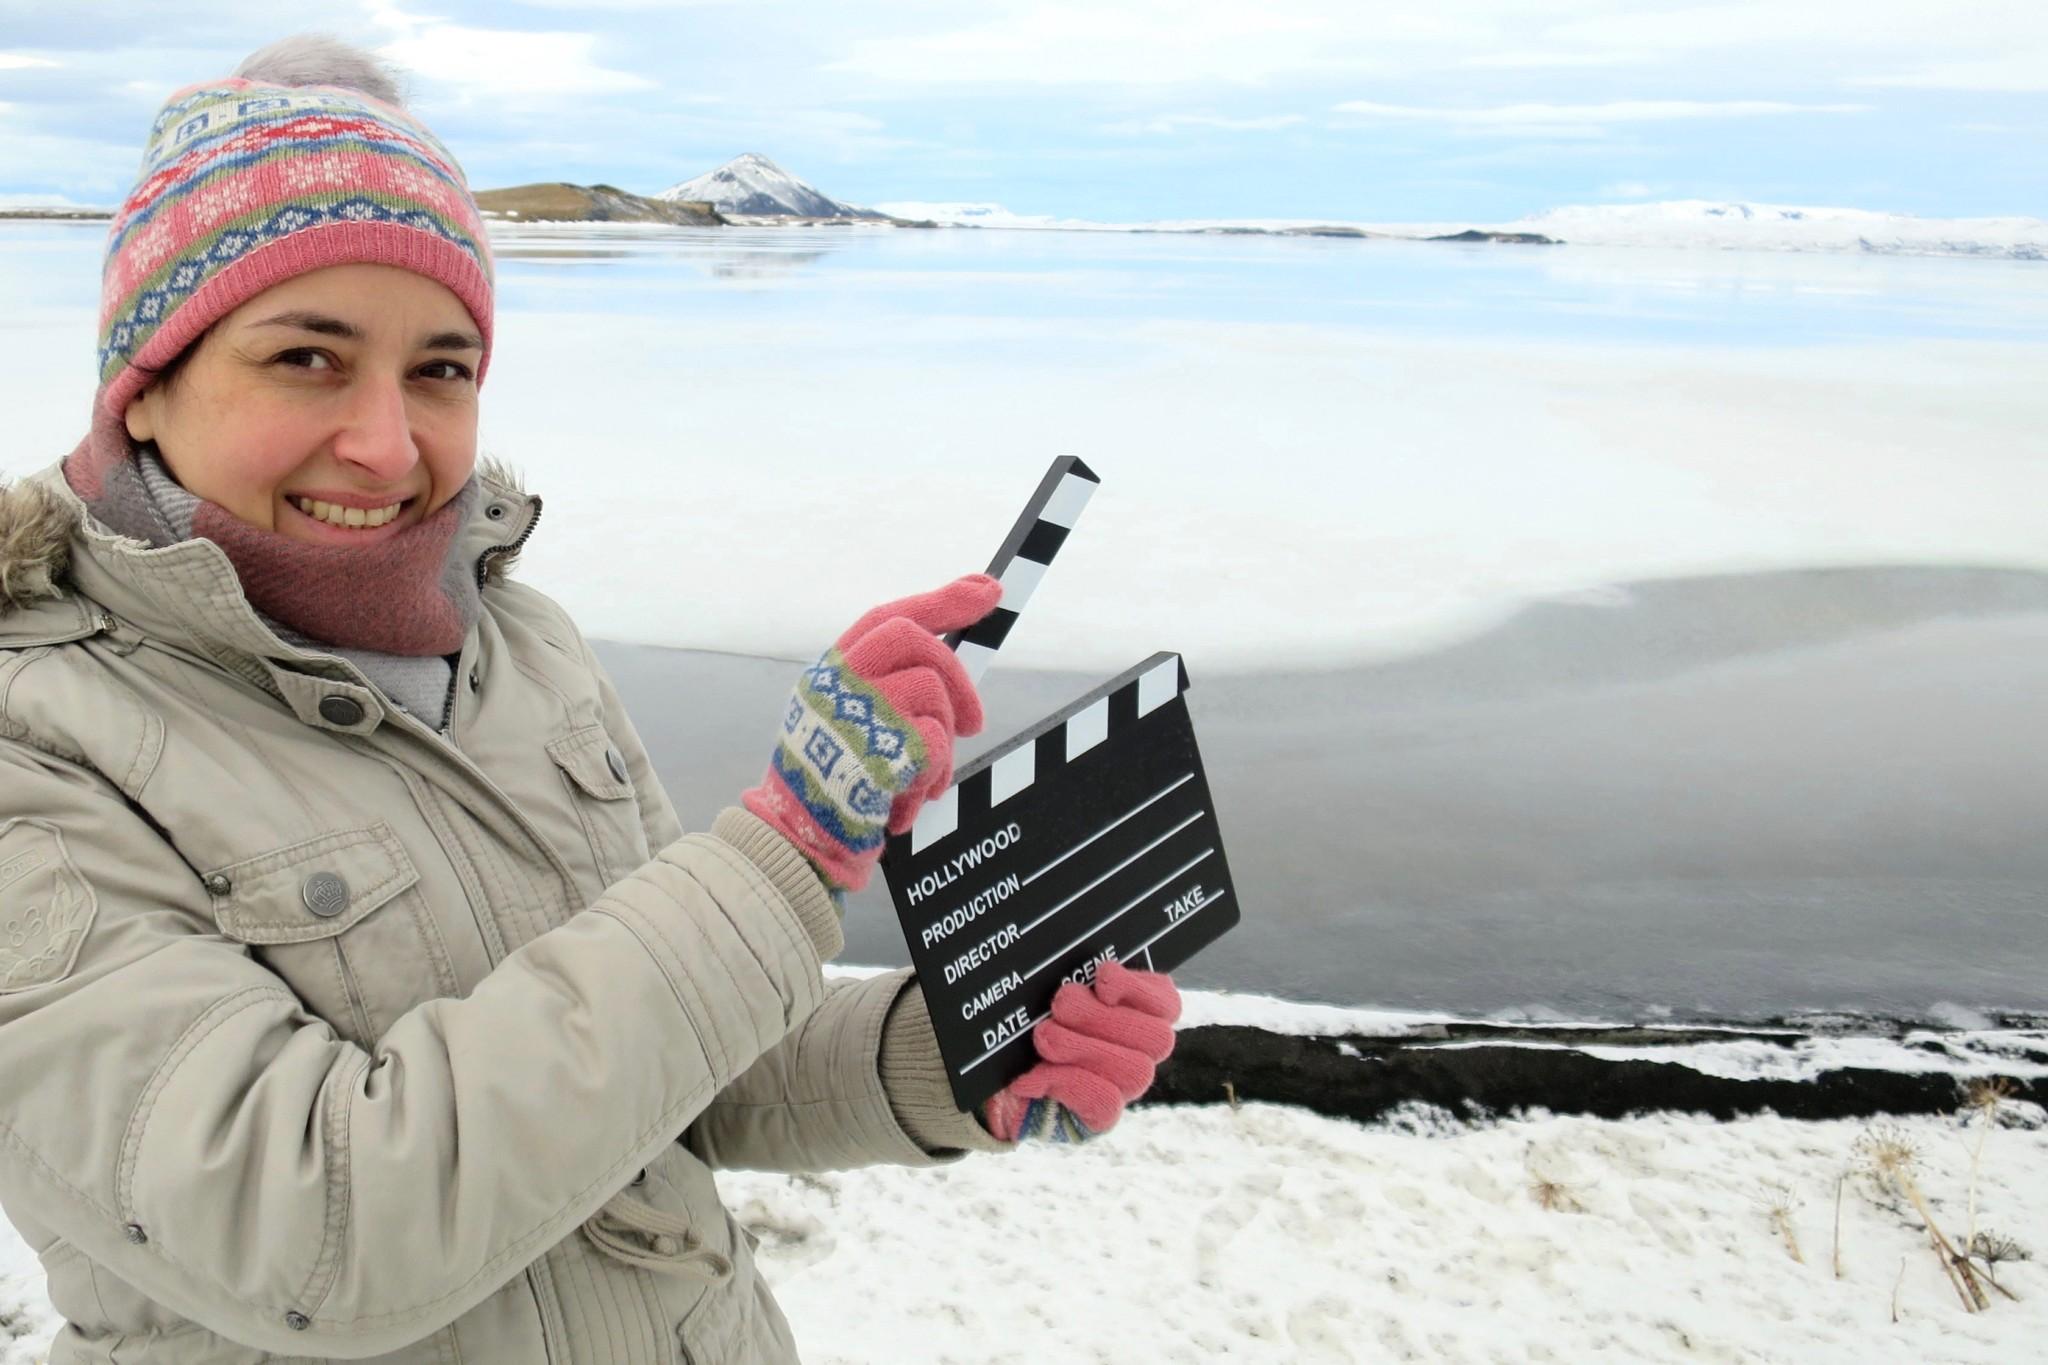 Andrea David vom Blog Filmtourismus